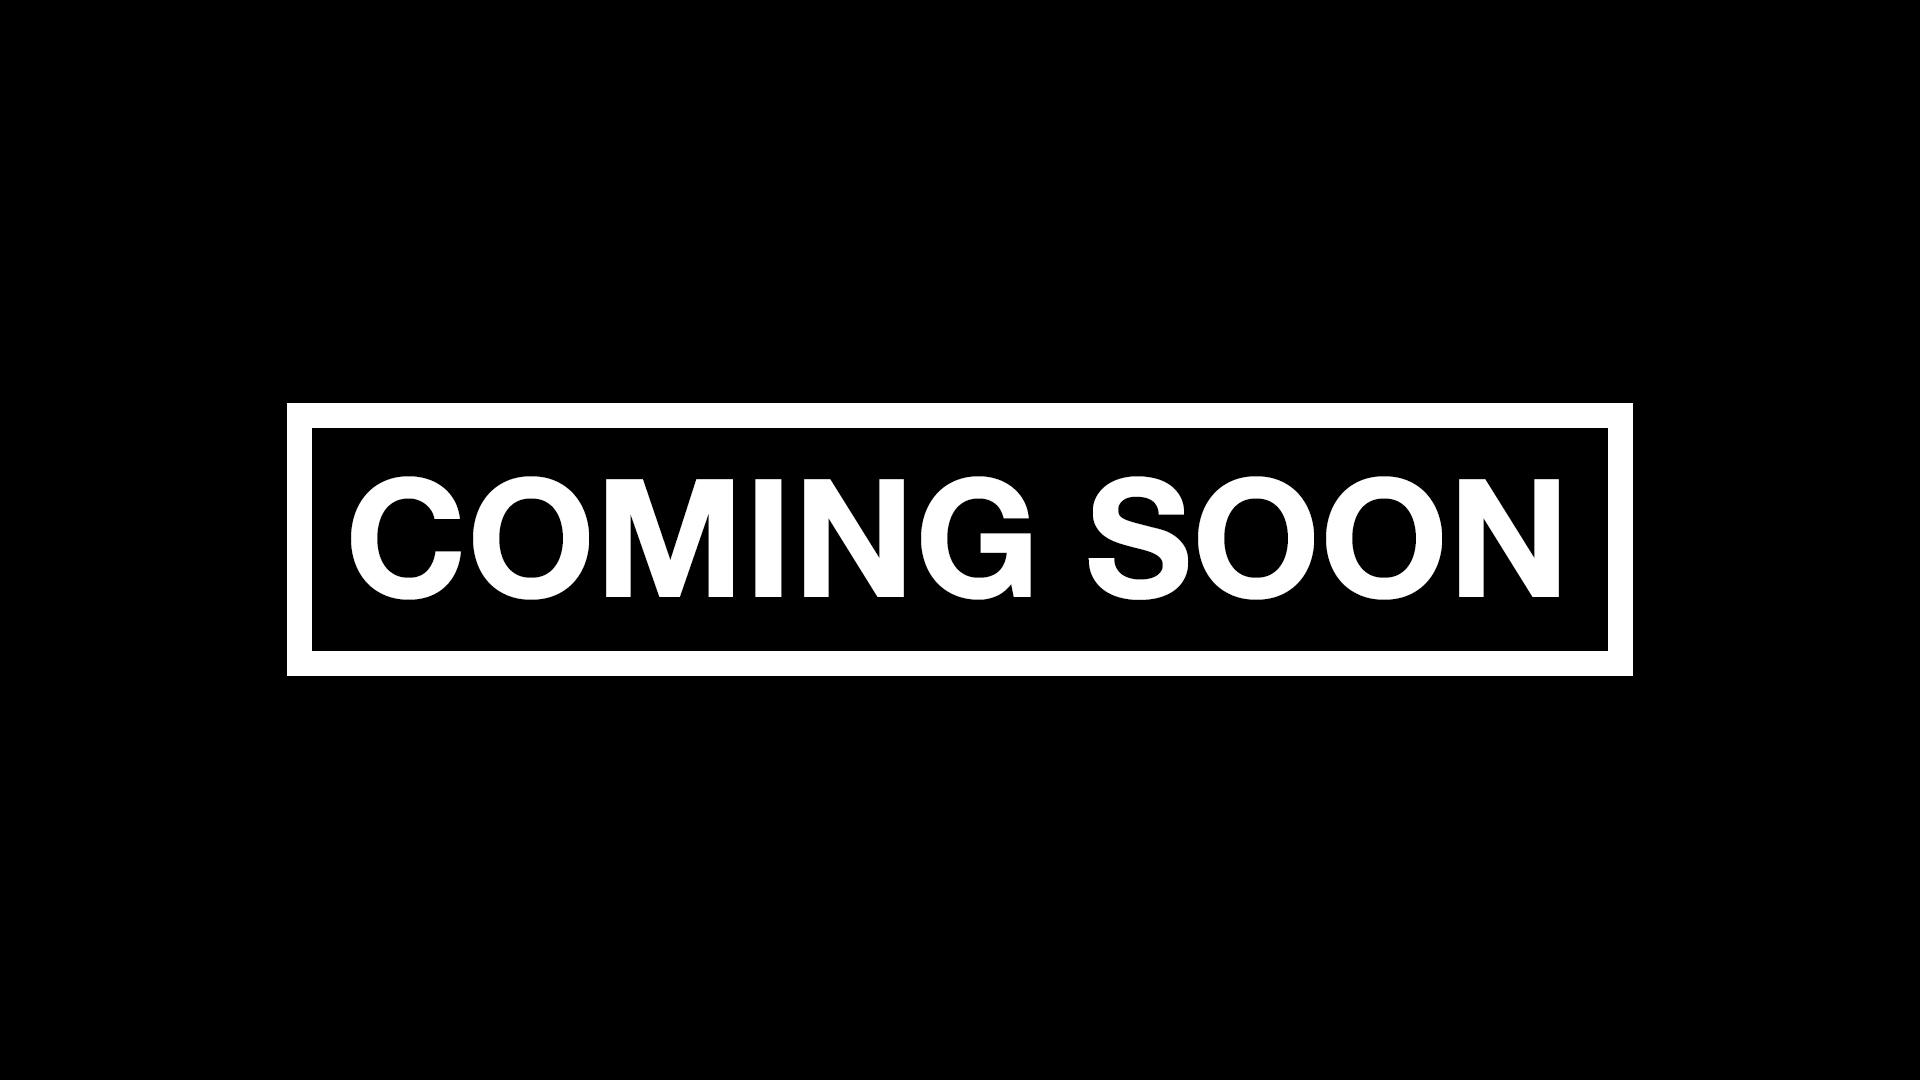 Coming Soon - Thumbnail.jpg